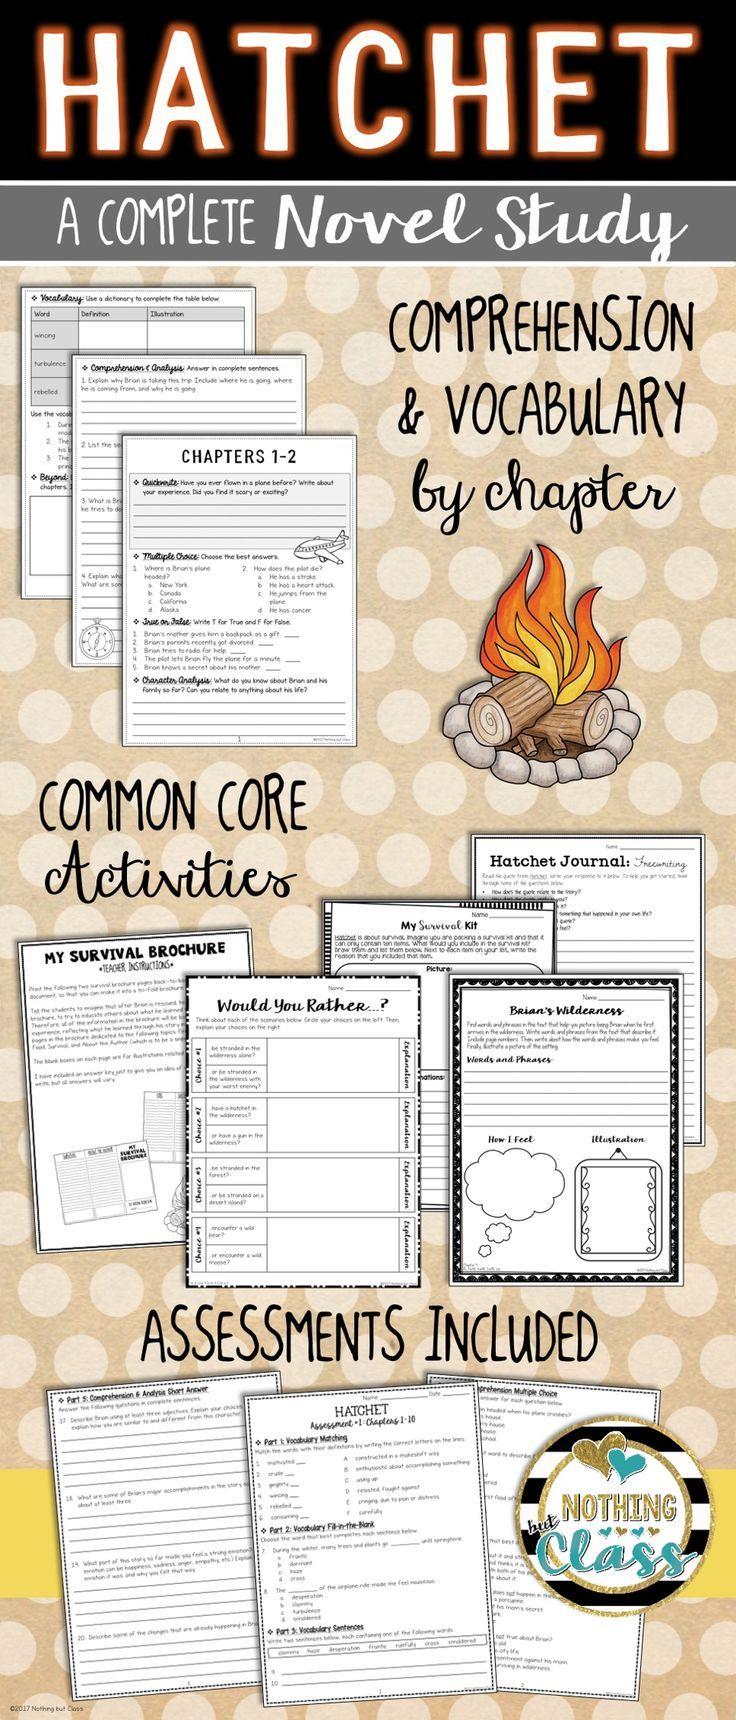 Hatchet Novel Study Unit: comprehension, vocabulary, activities